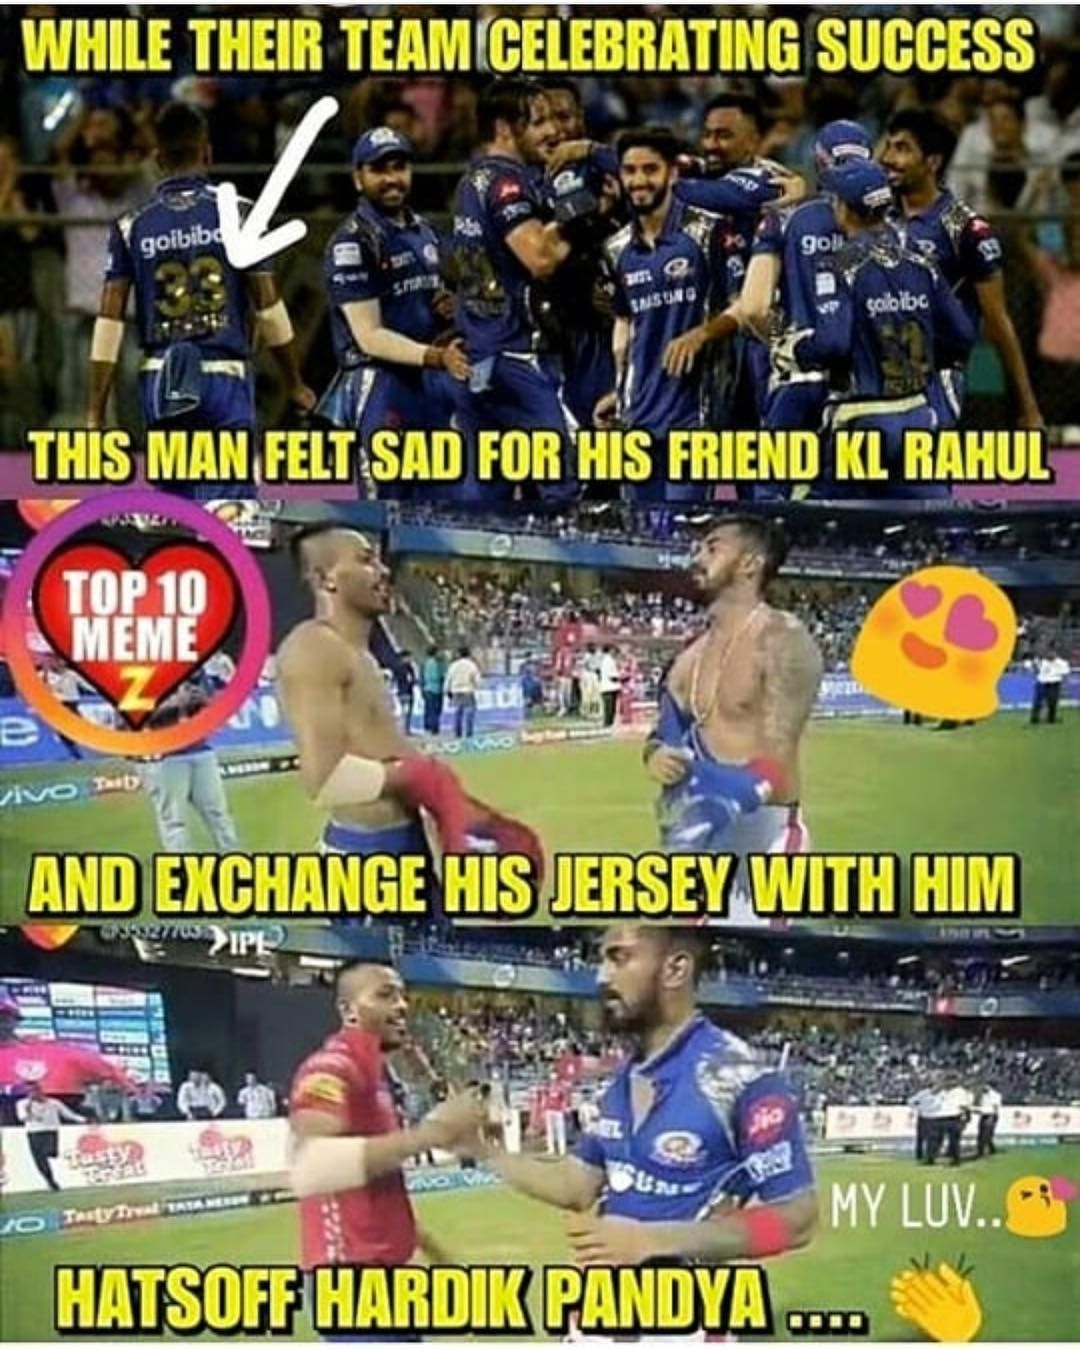 Https Iplnewslatest Blogspot Com 10 5k Likes 51 Comments Ipl Updates Daily Iplupdatesdaily On Inst Sports Memes India Cricket Team Mumbai Indians Ipl